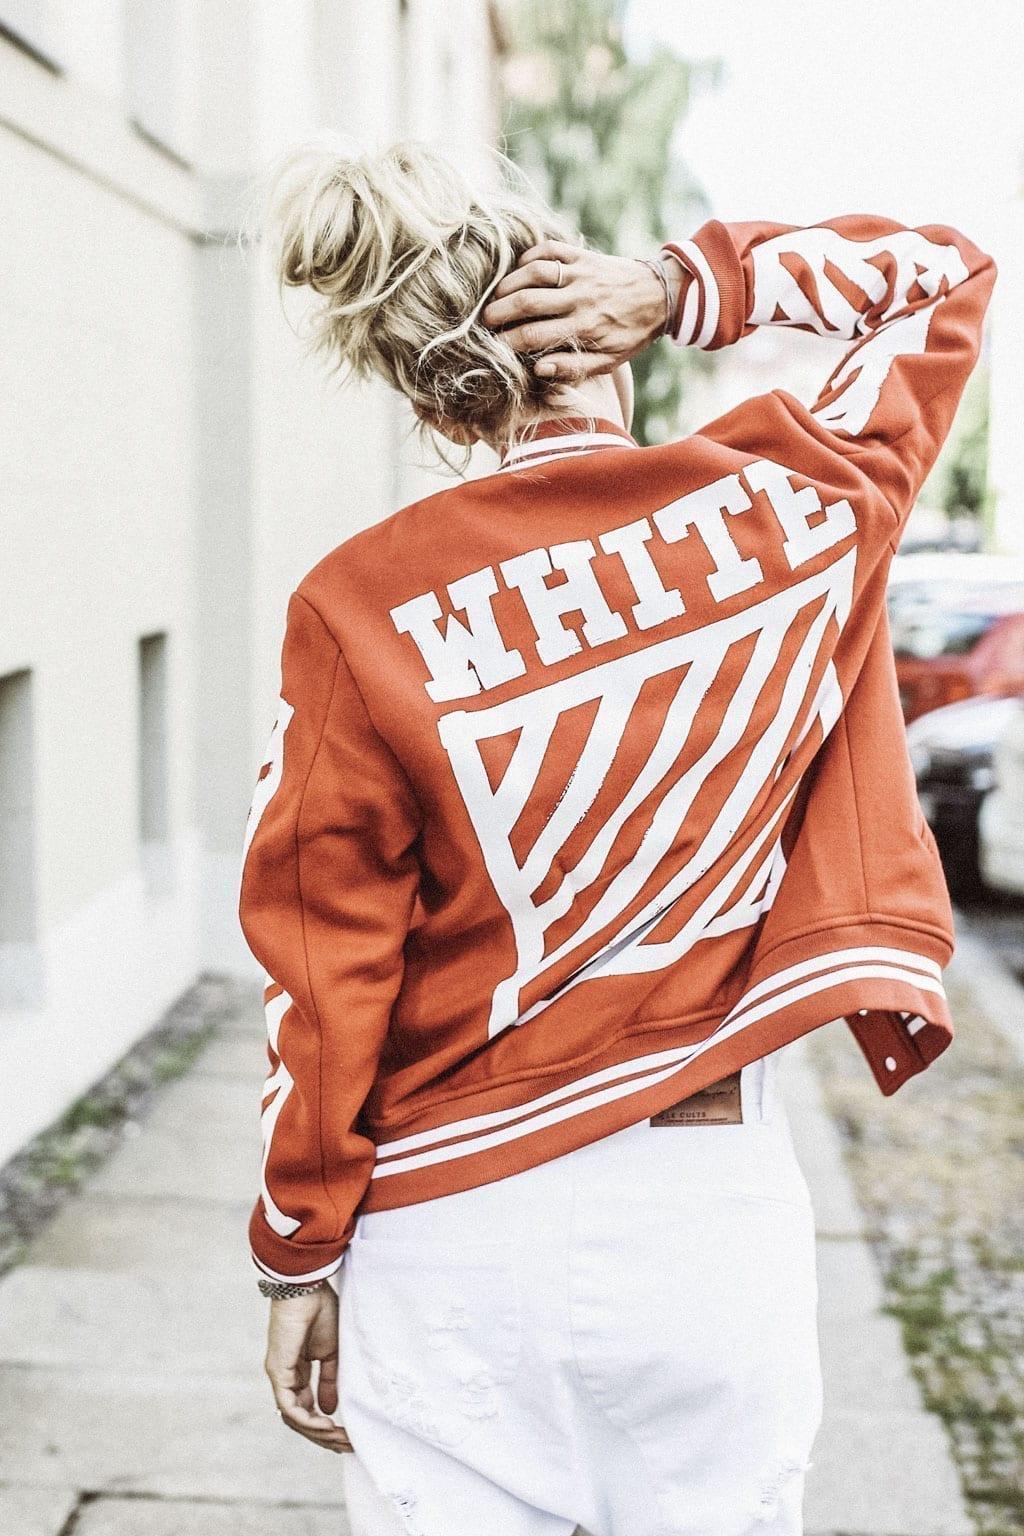 Constantly-K-karin-kaswurm-white-red-rieger-jacket-salzburg-fashion-street-style-8404